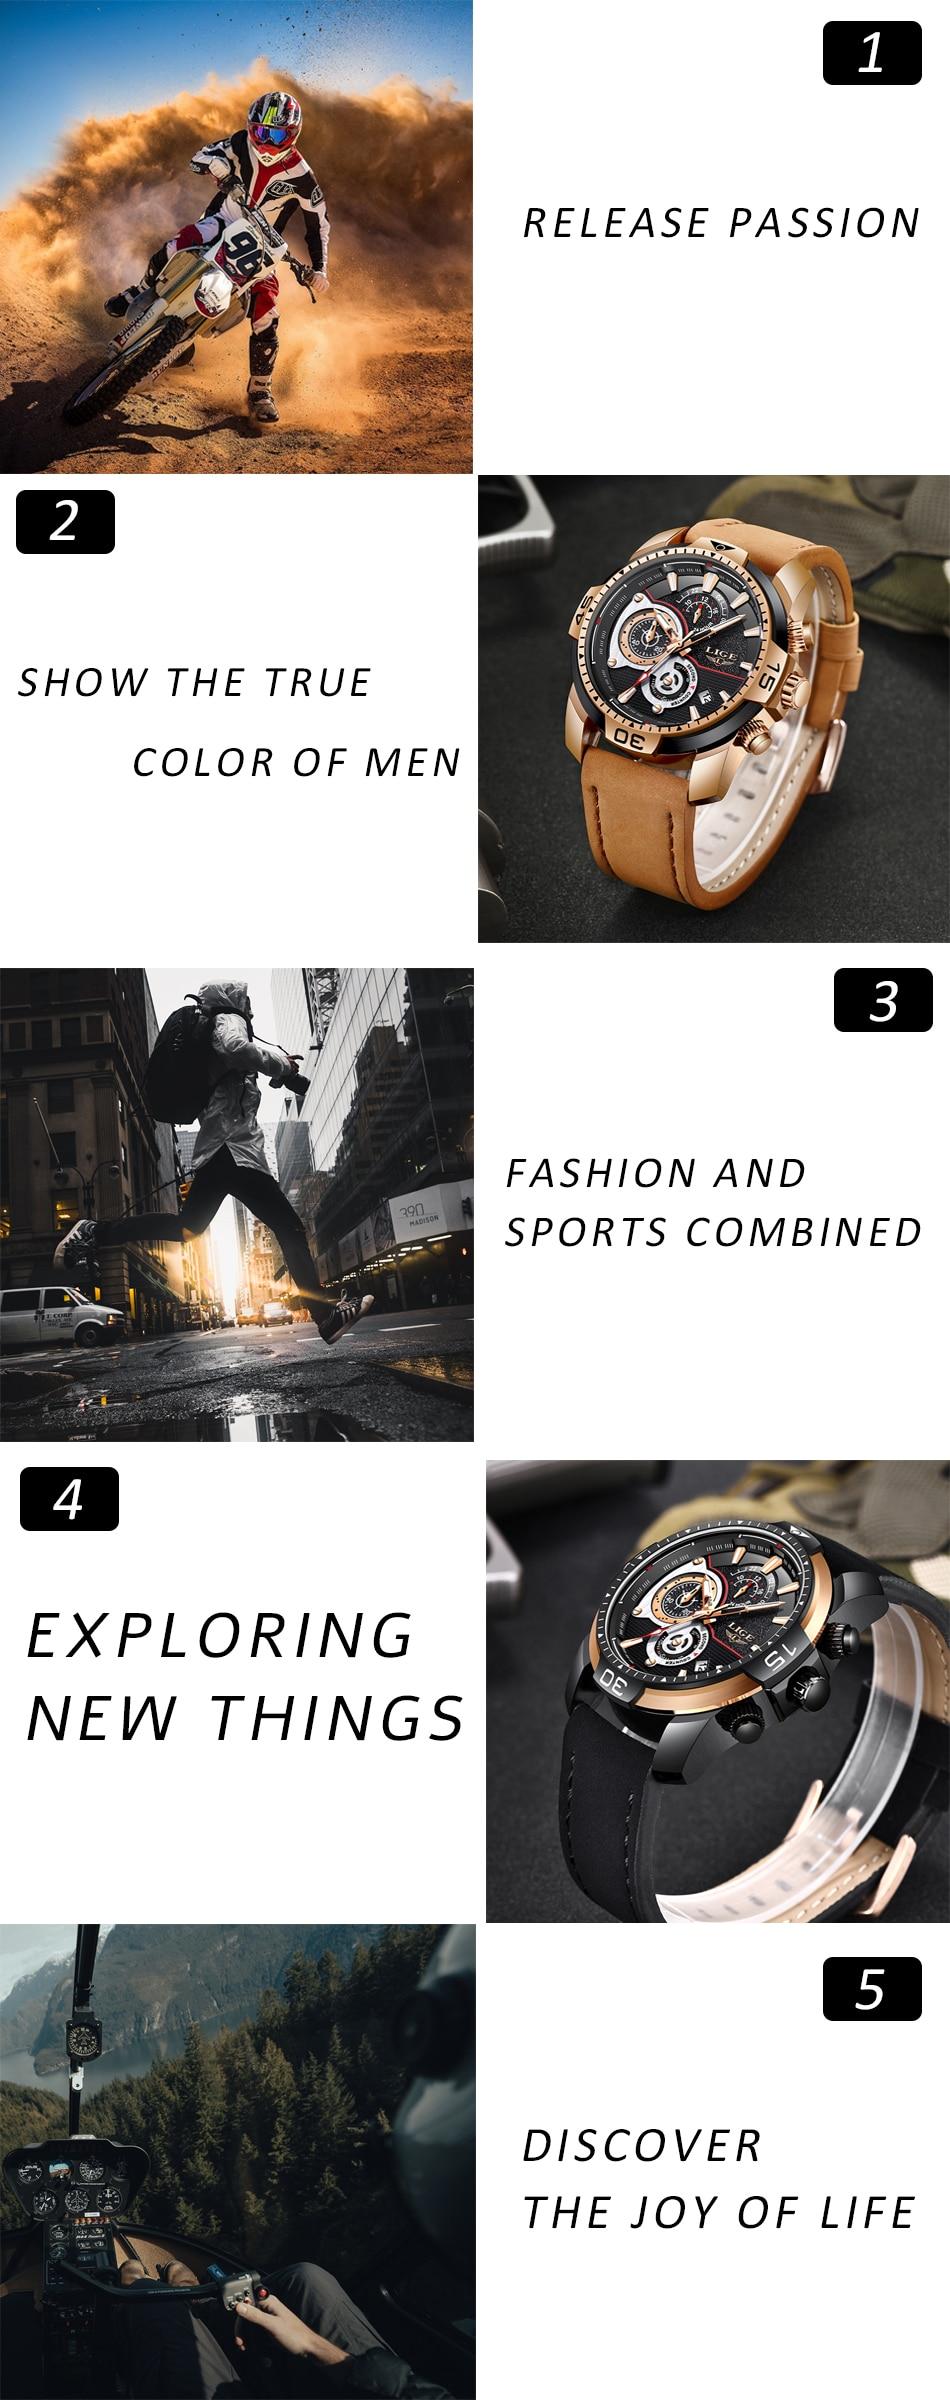 HTB1e7 fXozrK1RjSspmq6AOdFXay LIGE Mens Watches Top Brand Luxury Casual Leather Quartz Clock Male Sport Waterproof Watch Gold Watch Men Relogio Masculino